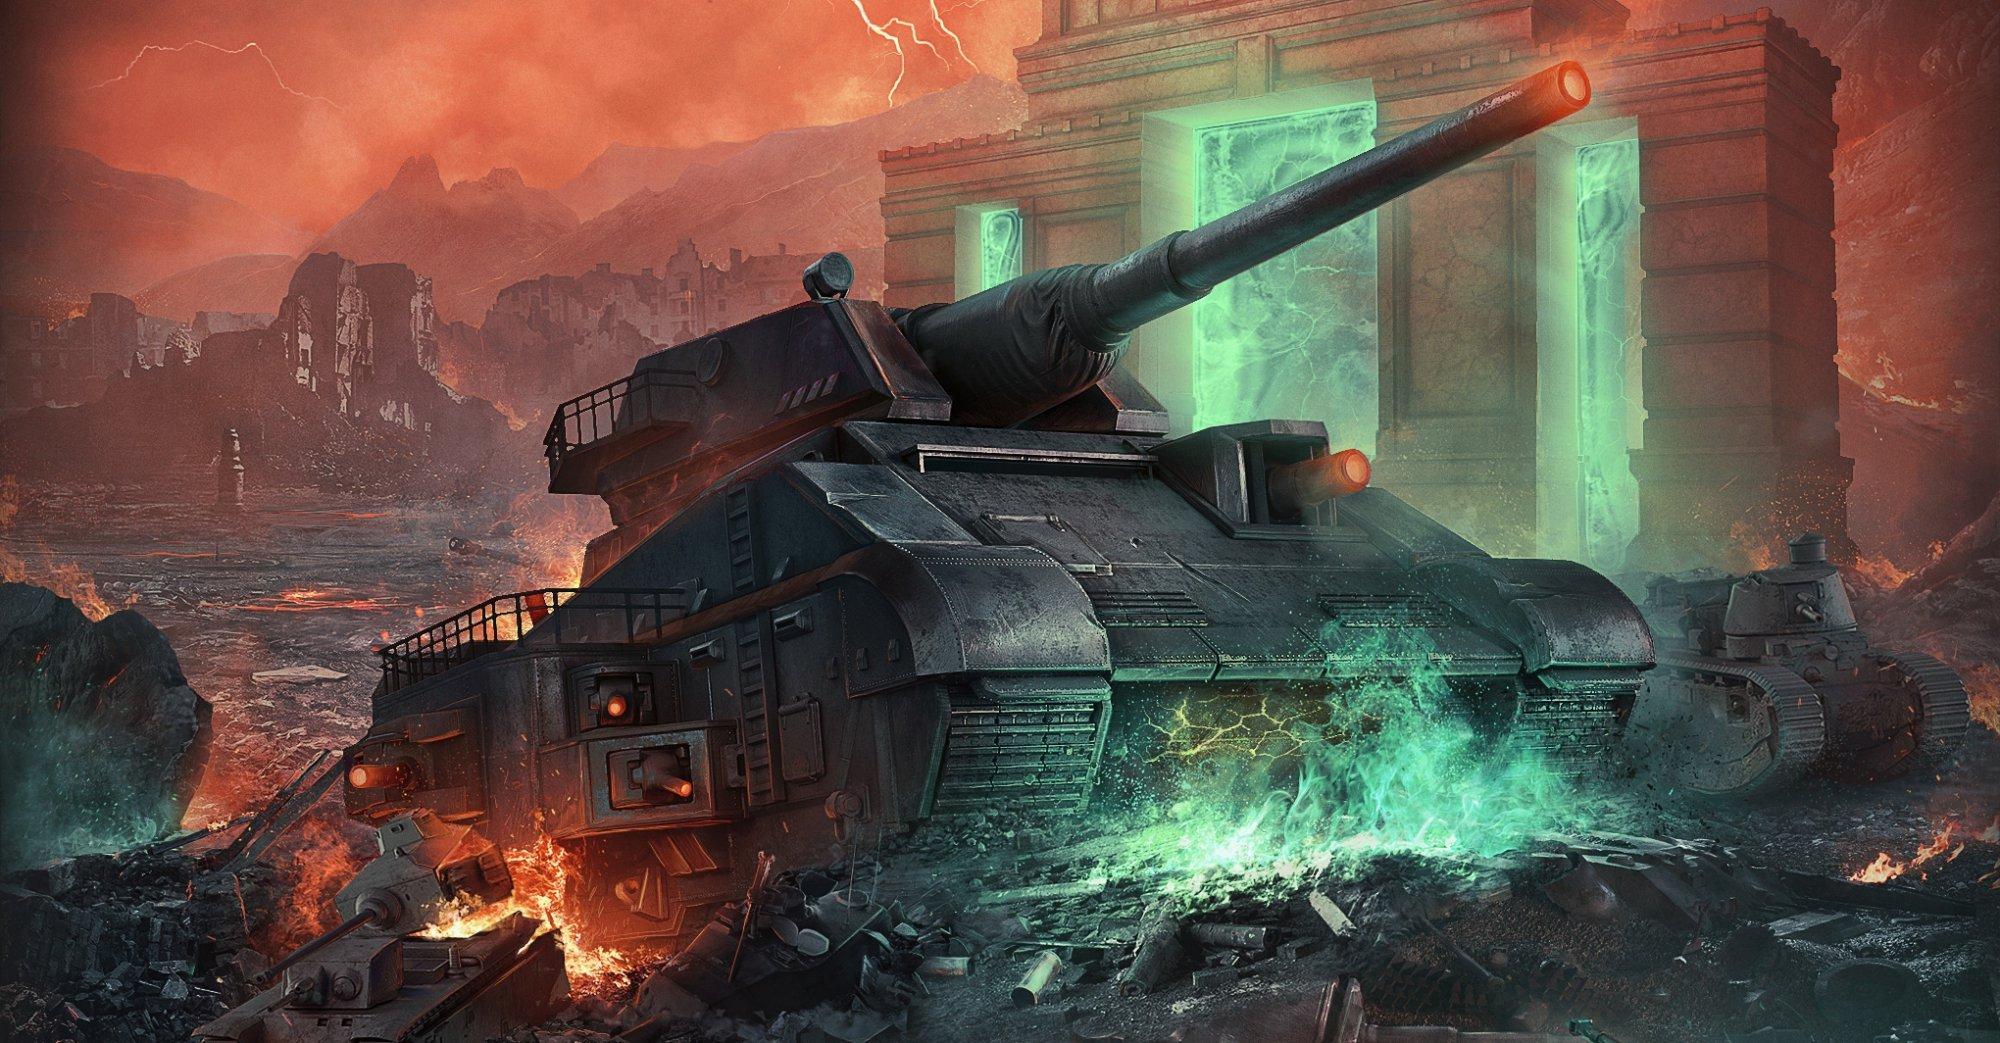 Картинки по запросу танки вот